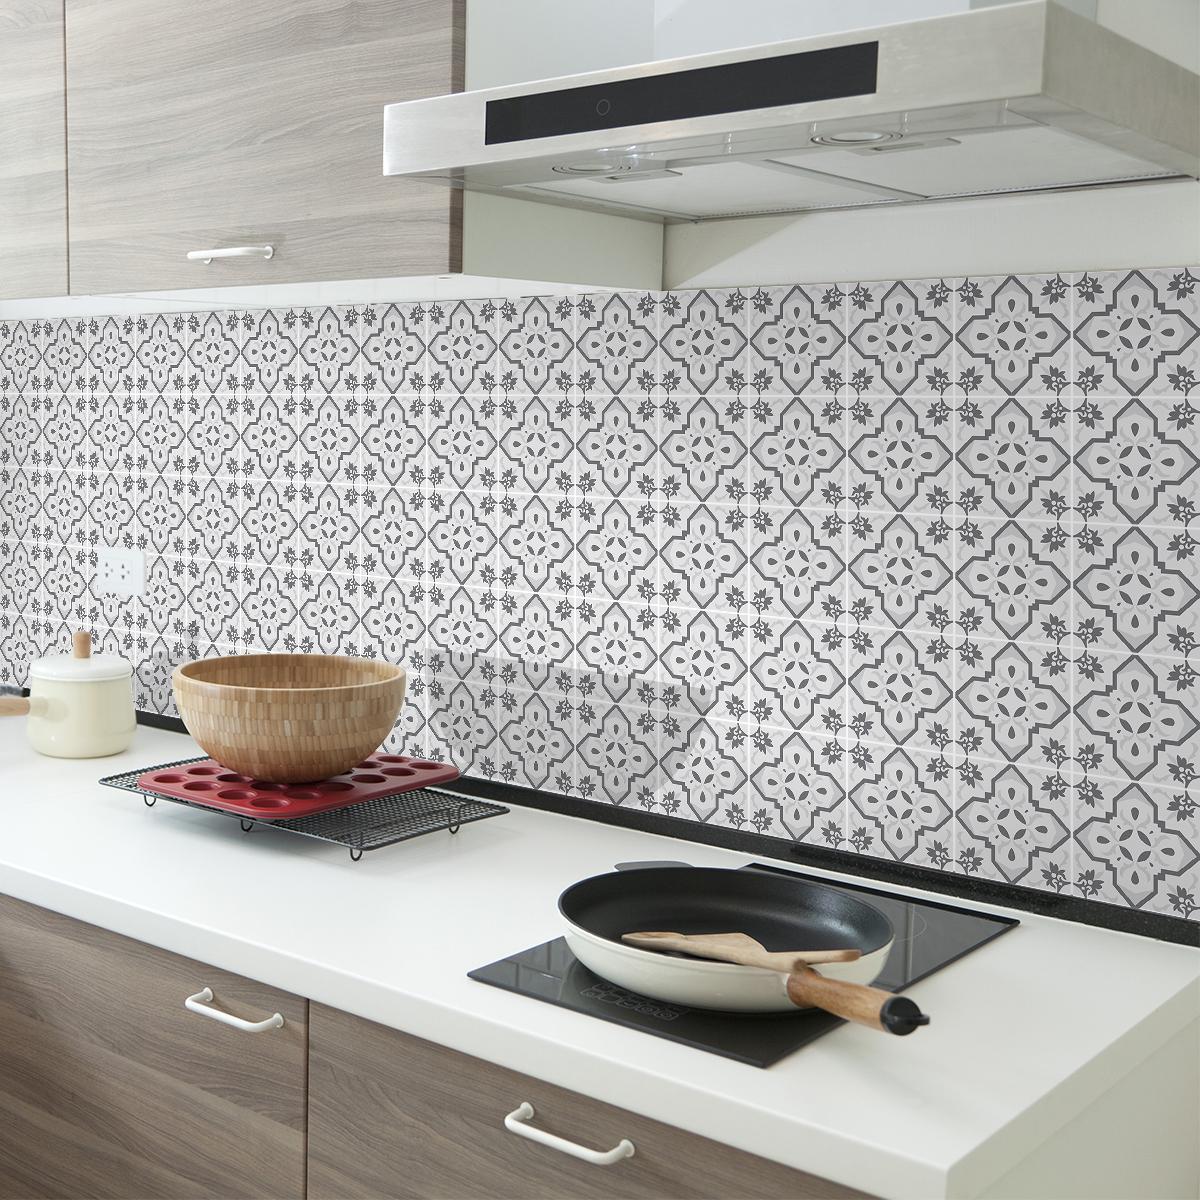 30 stickers carrelages azulejos christina cuisine - Stickers cuisine carrelage ...